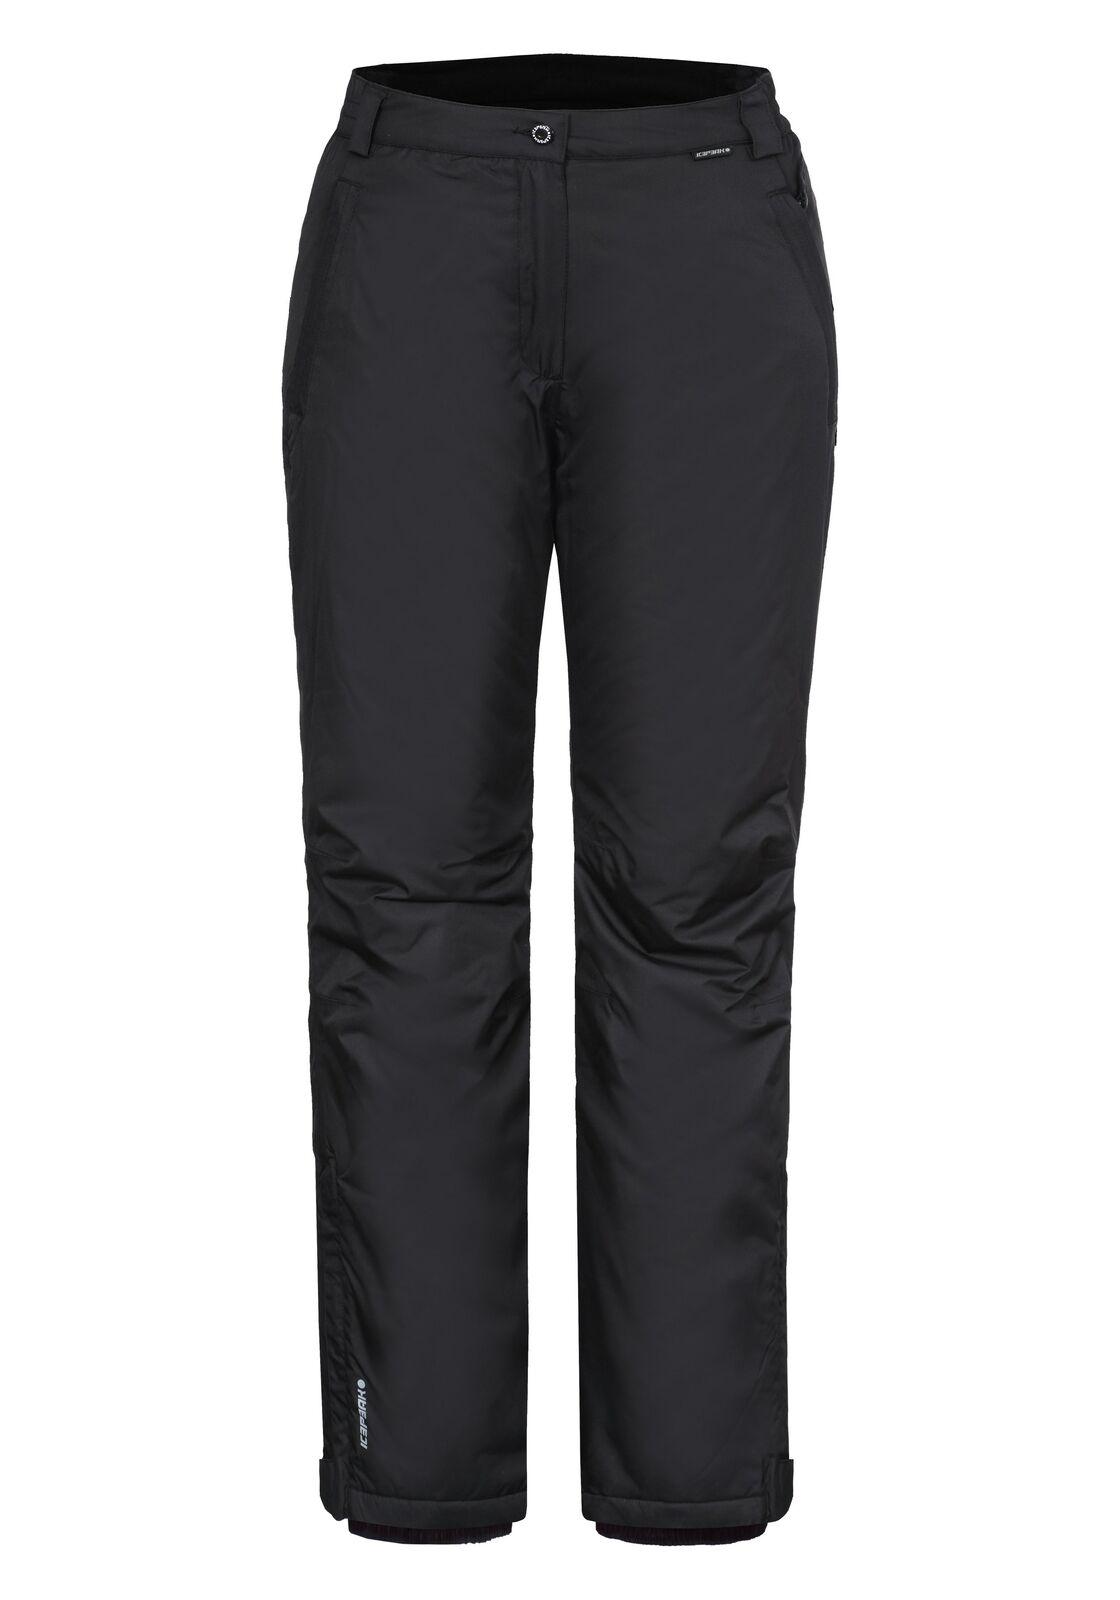 Pantalone da sci damen Icepeak Nanna schwarz Codice 54037-501-990